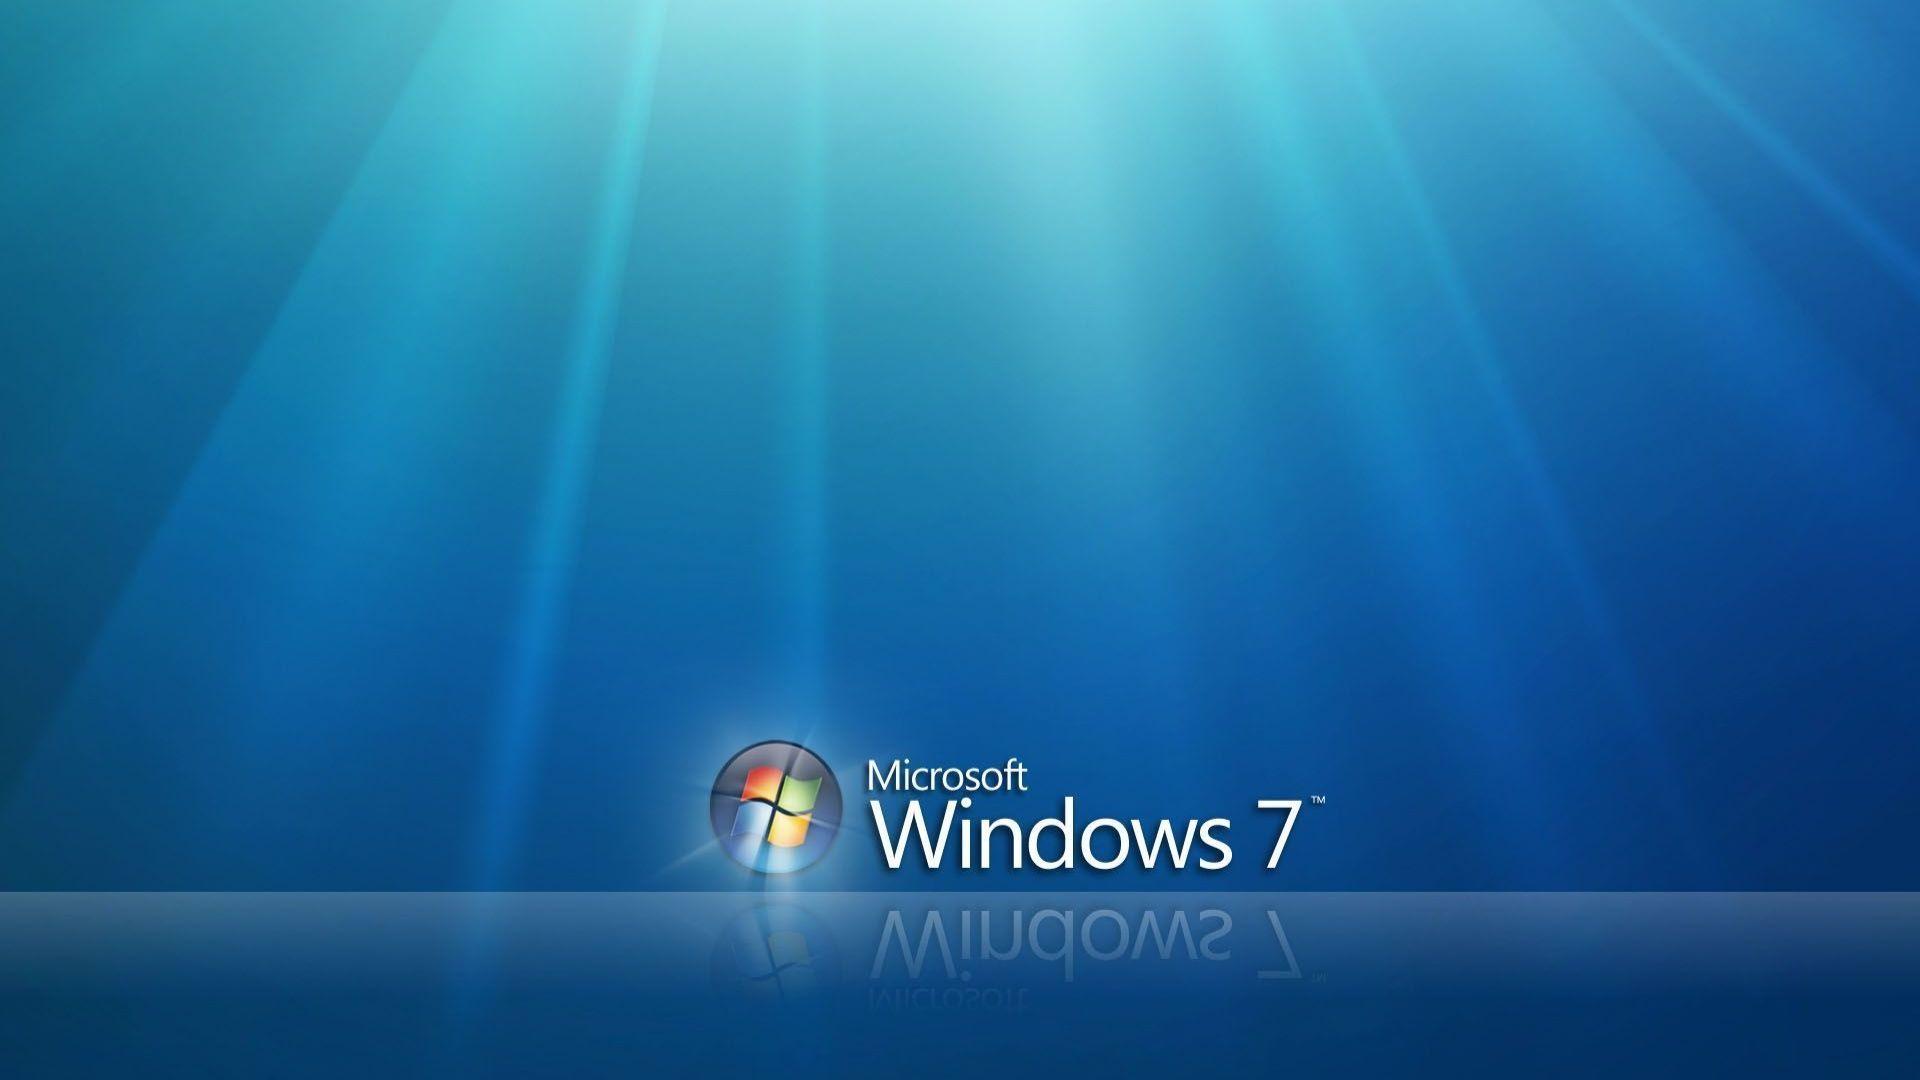 windows 7 wallpaper themes